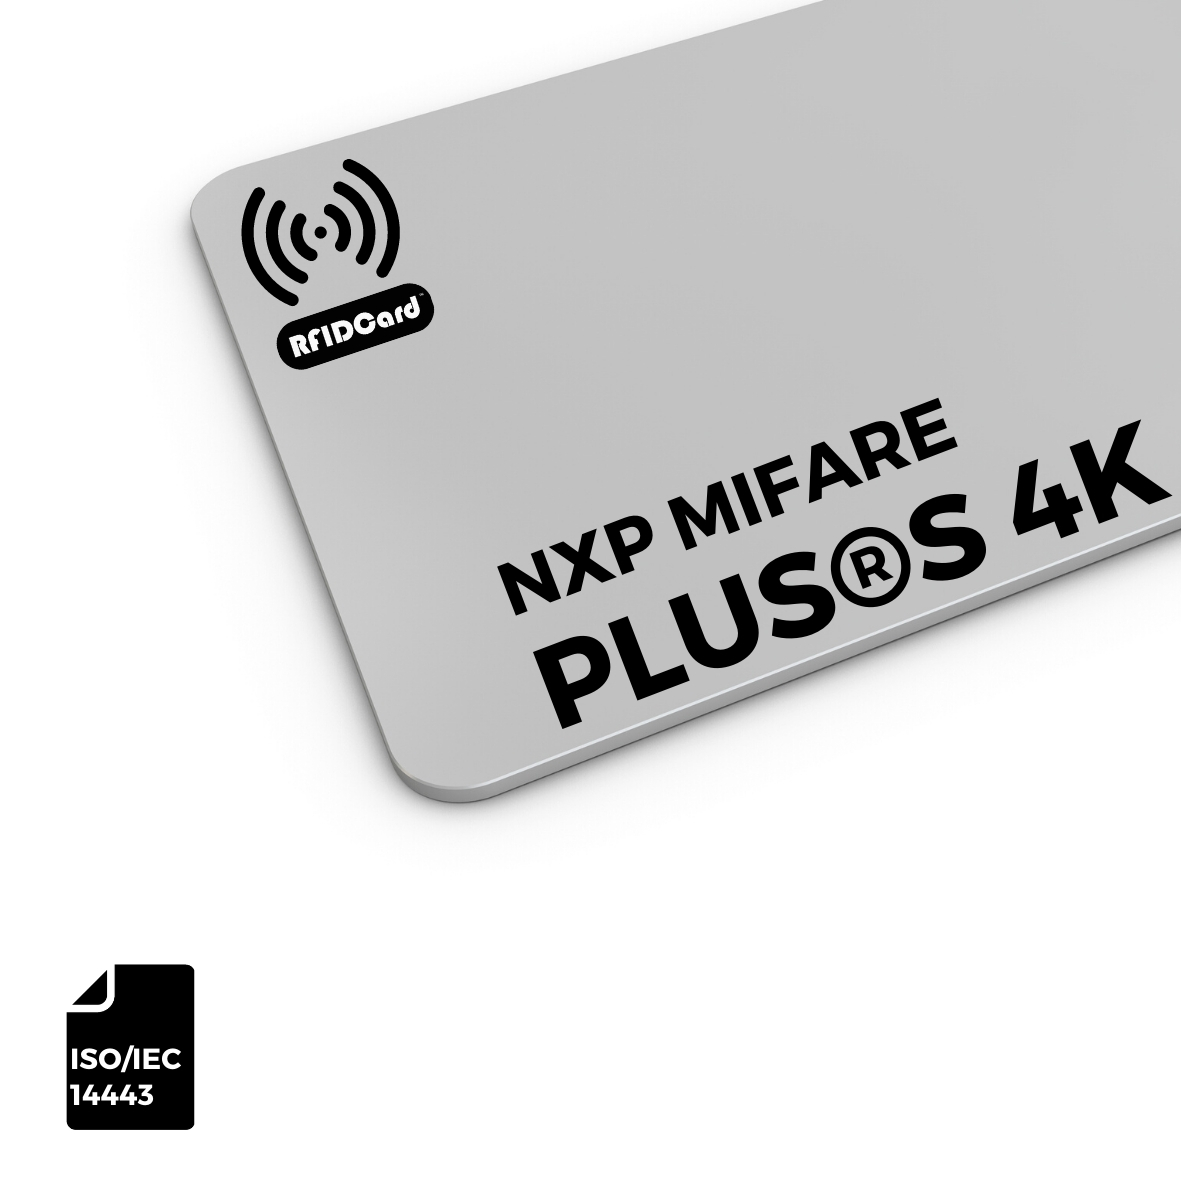 NXP MIFARE Plus®S 4k RFID CARD